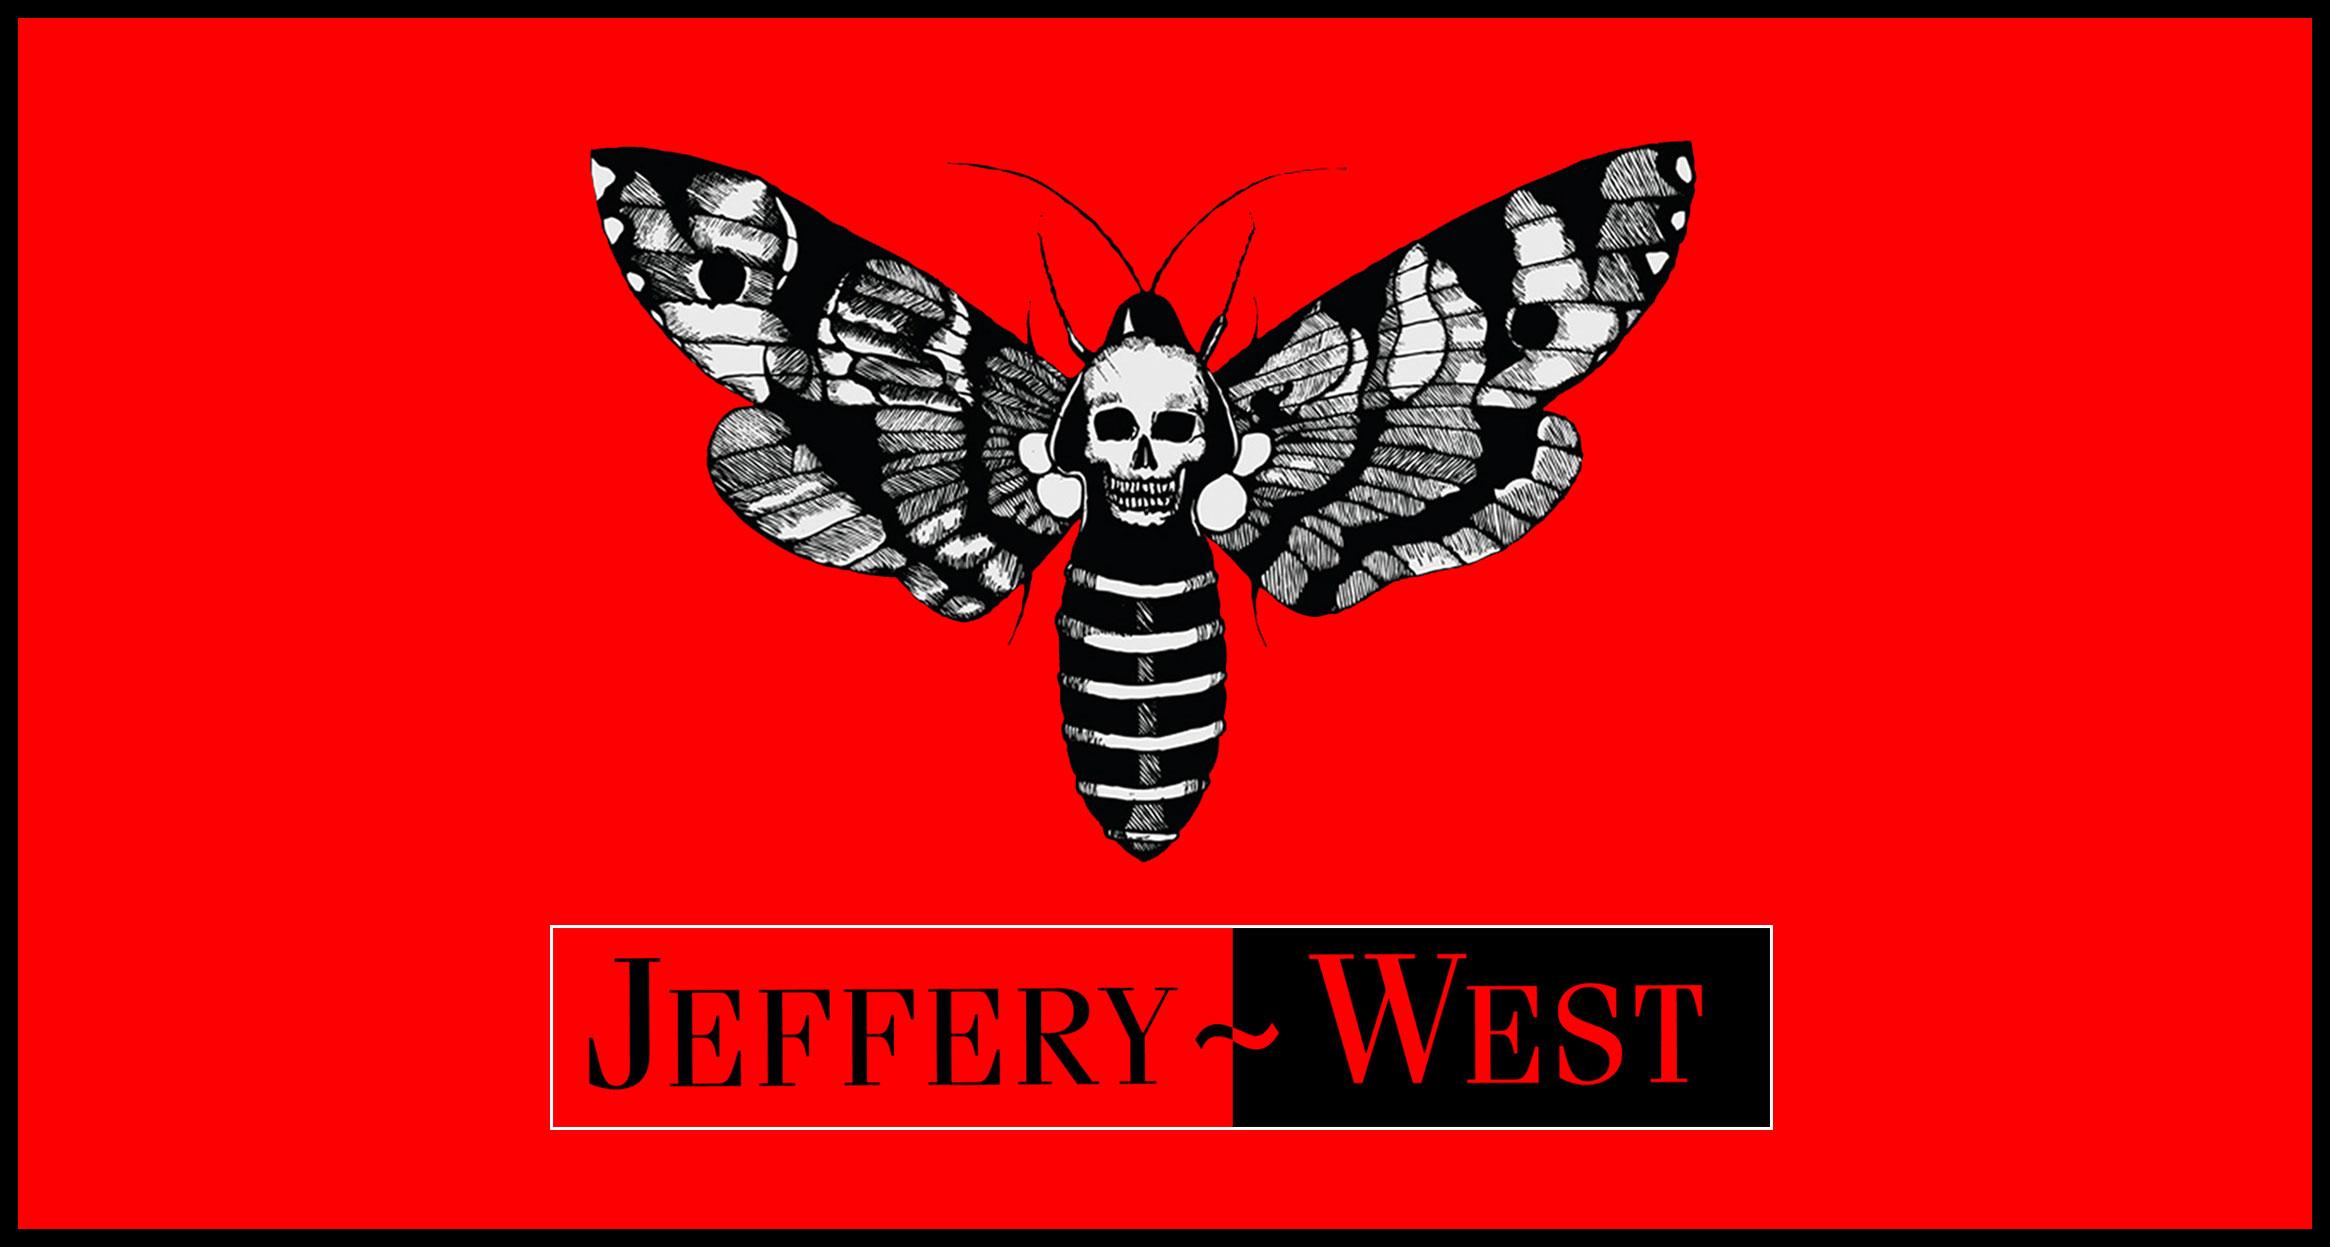 Jeffery-West Celebrated House of Intrigue